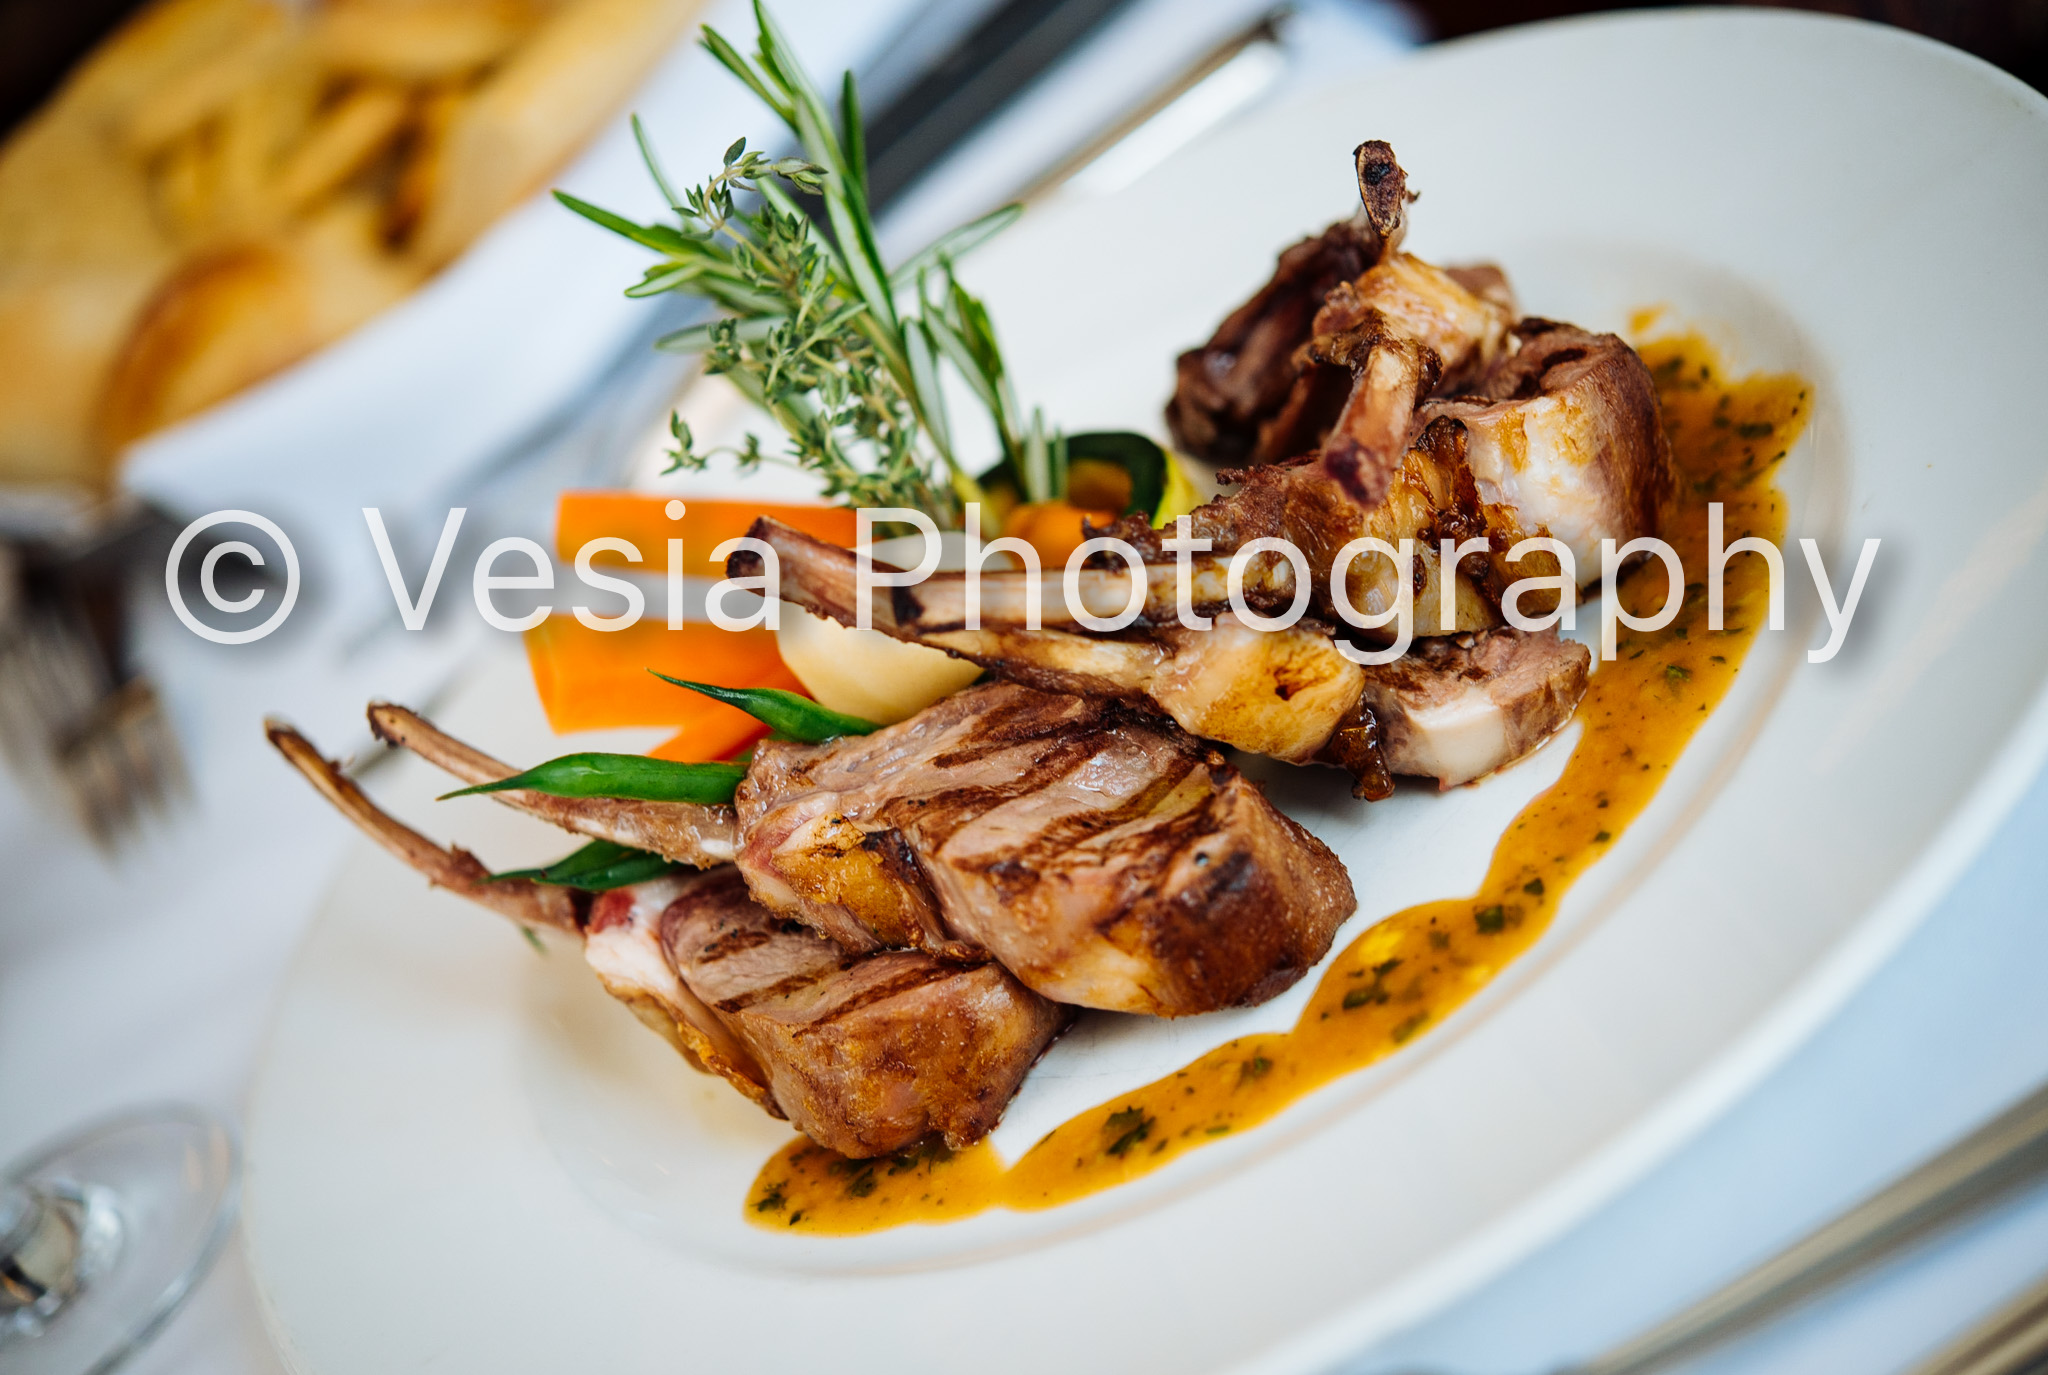 Campari_Centro_Food_Proofs-30.jpg